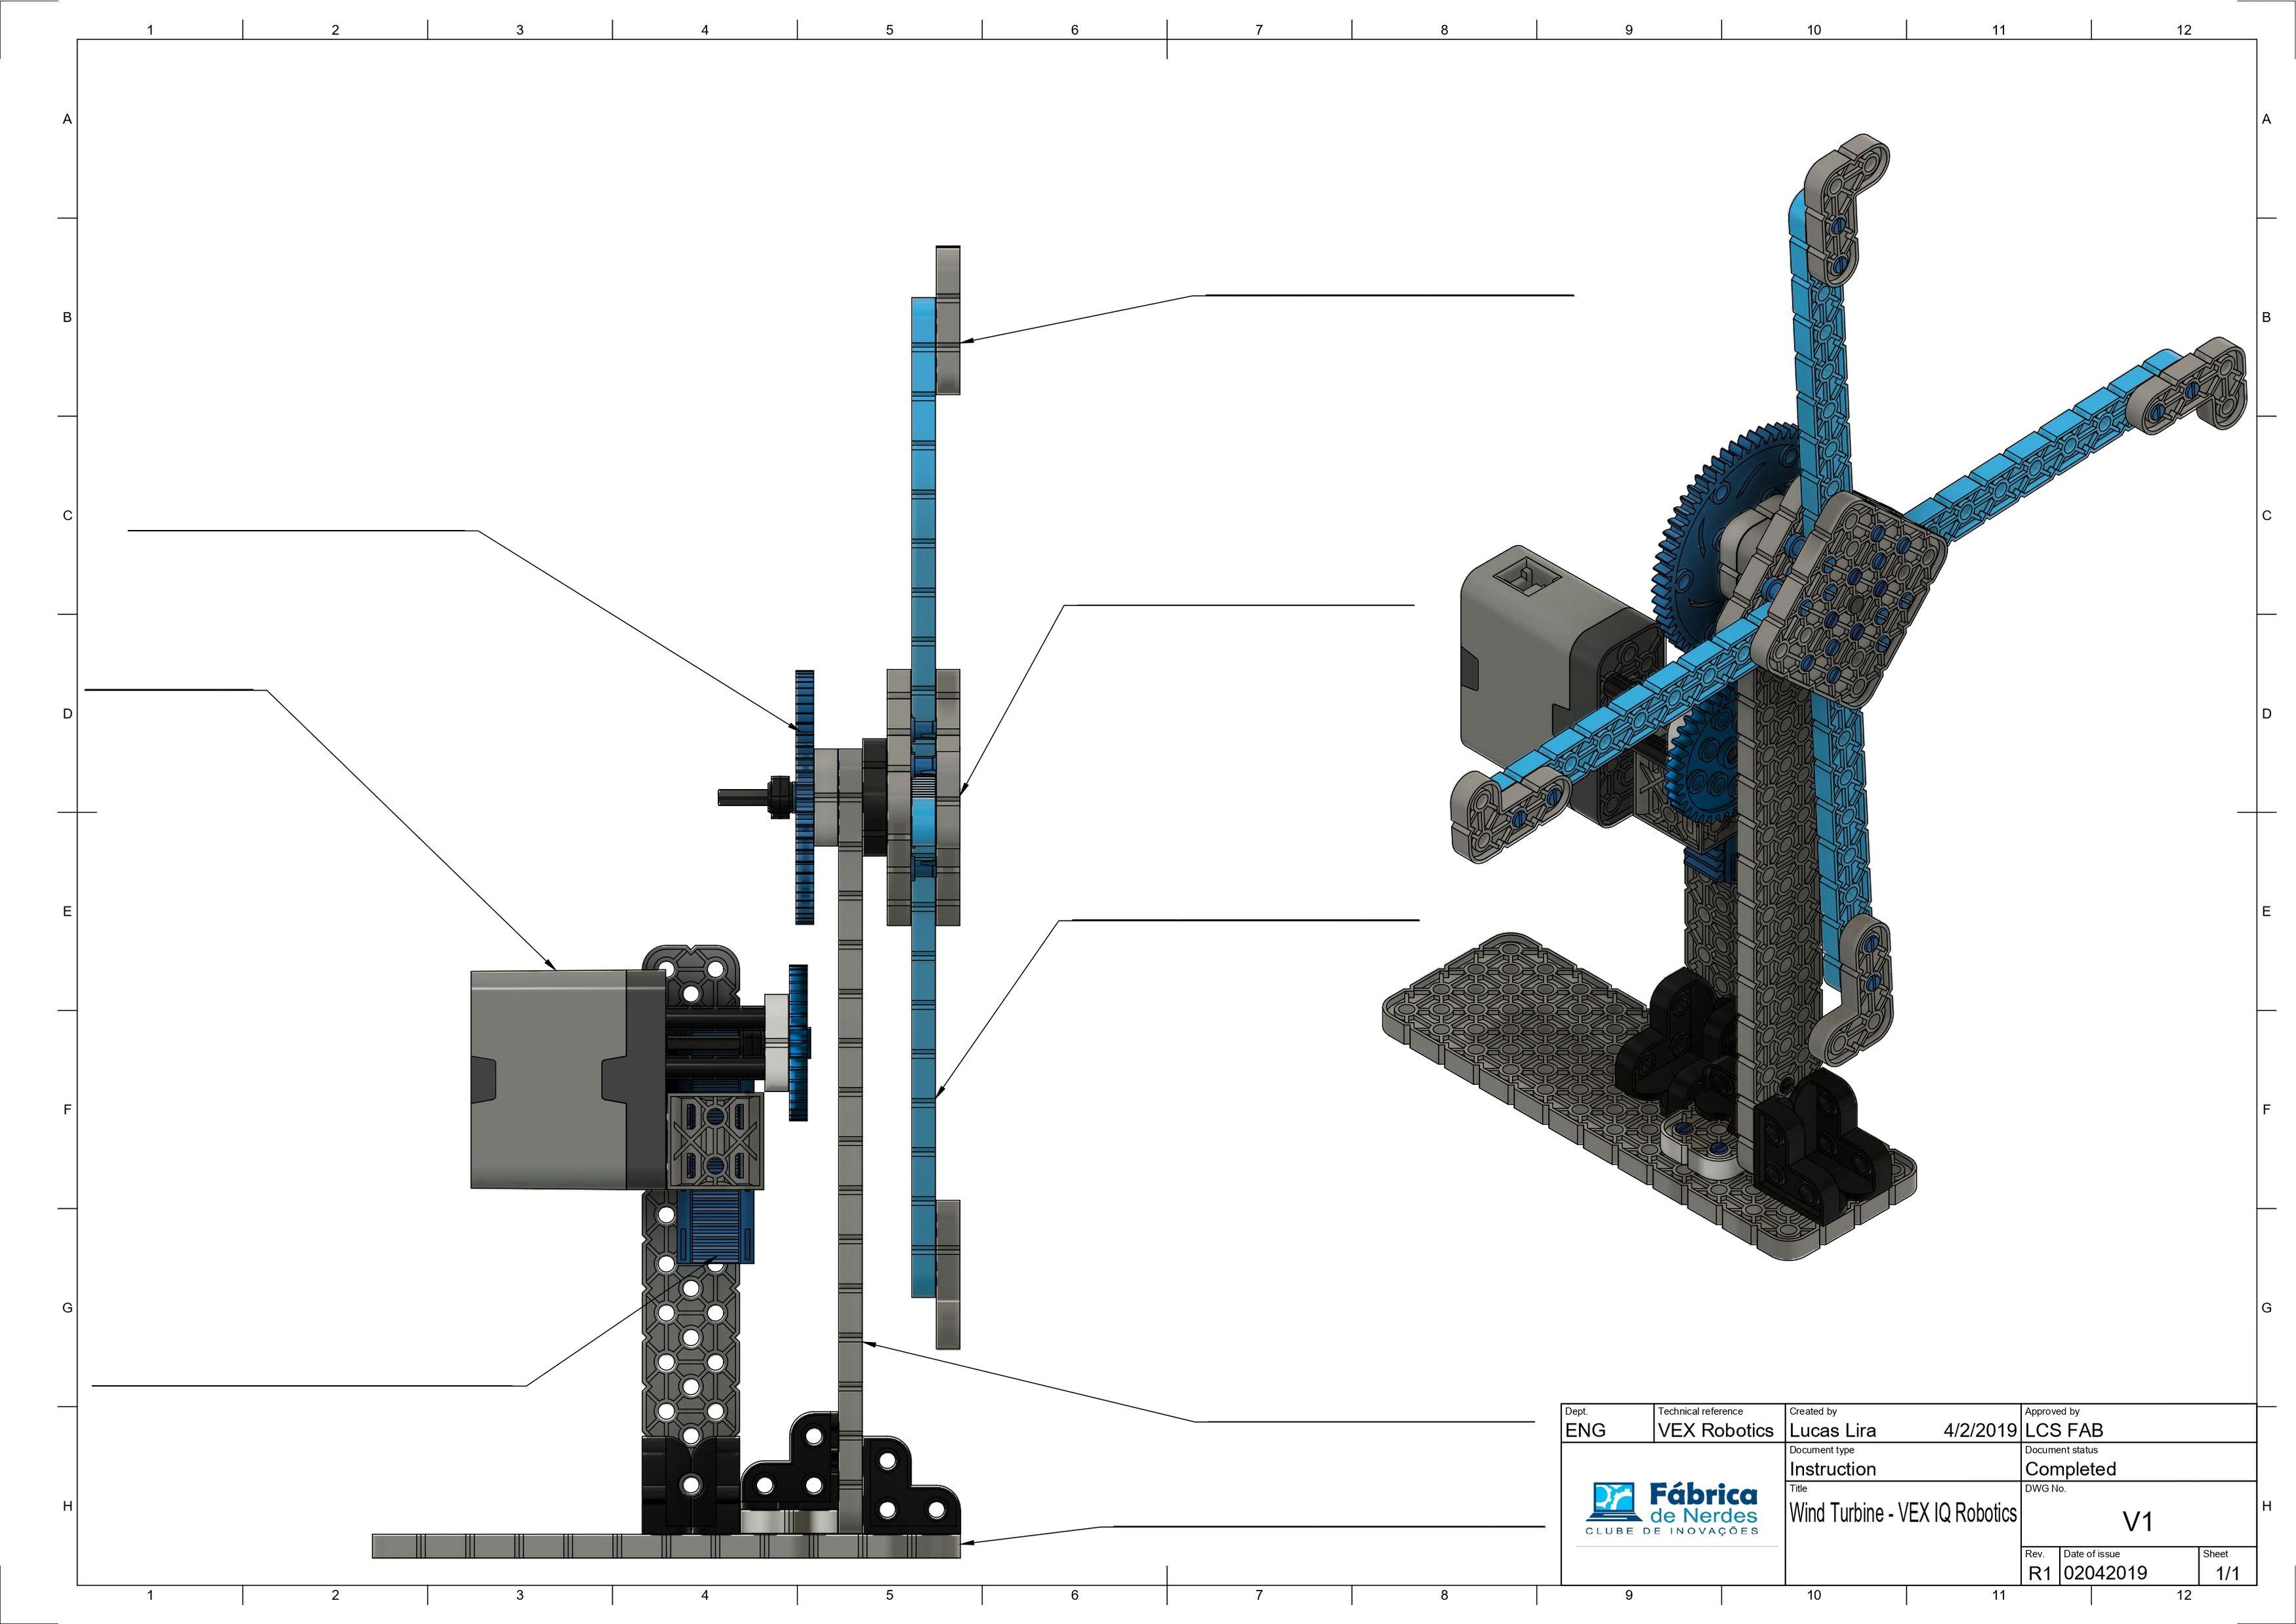 Wind-turbine---vex-iq-robotics-by-fabrica-de-nerdes-drawing02-v2-page-0001-3500-3500